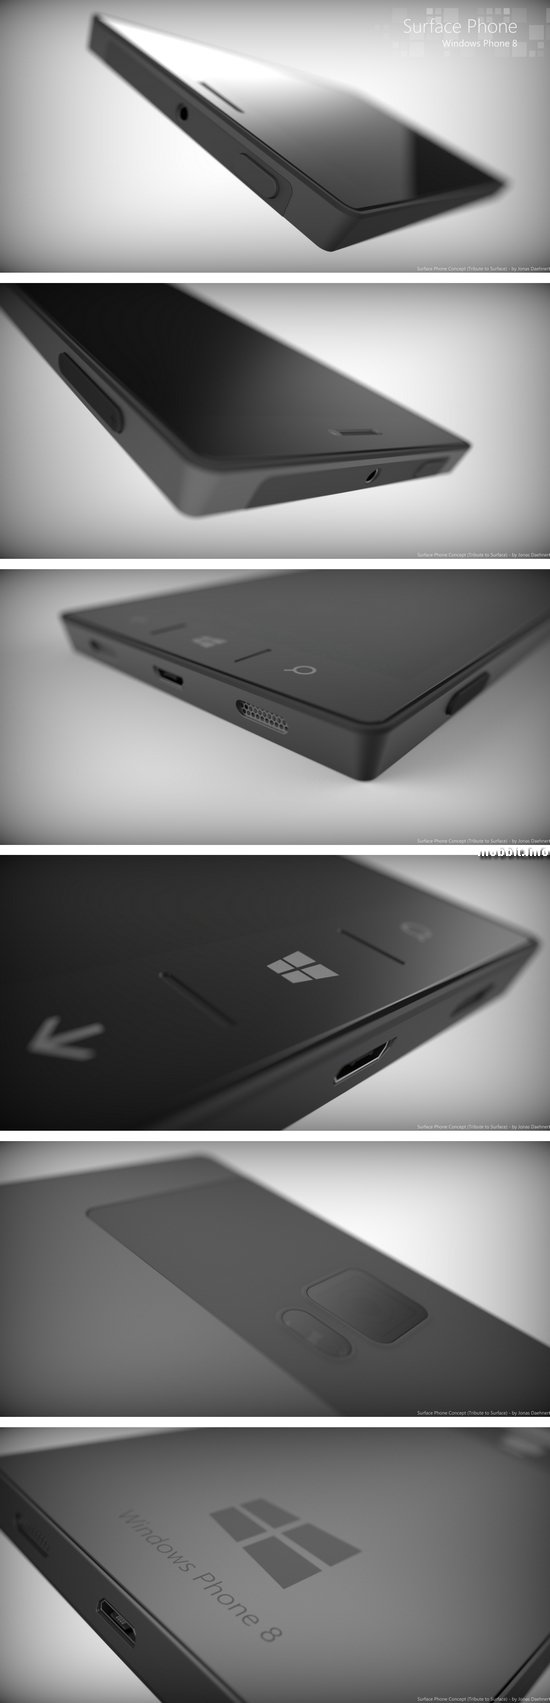 Концептуальный смартфон Microsoft Surface